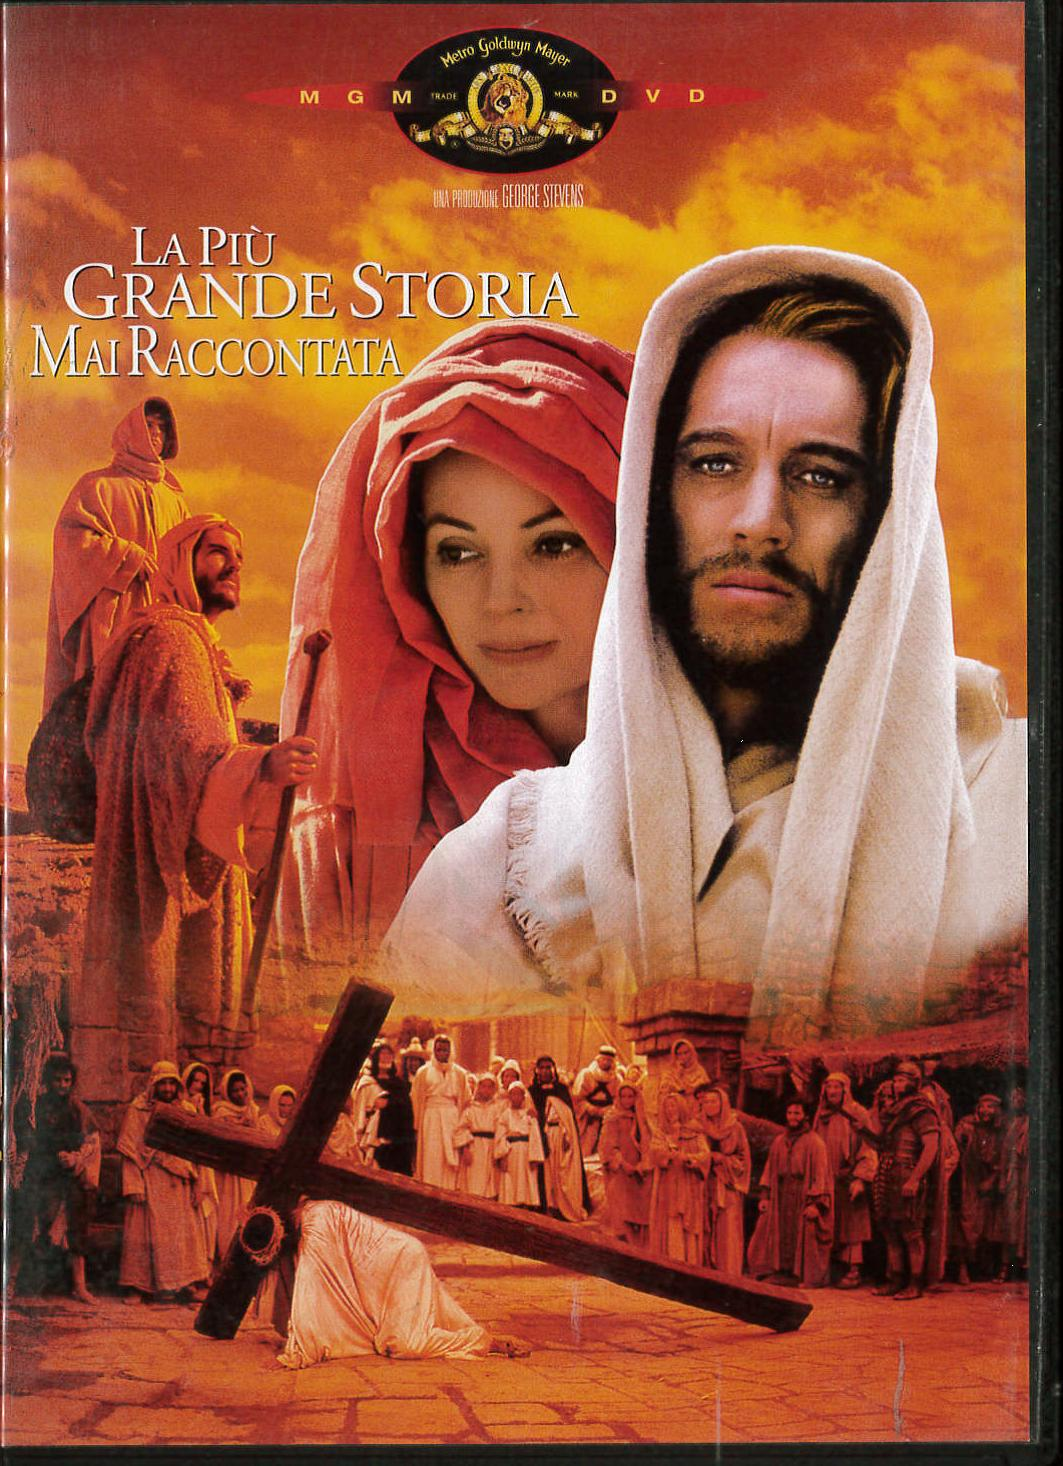 LA PIU' GRANDE STORIA MAI RACCONTANTA (DVD)